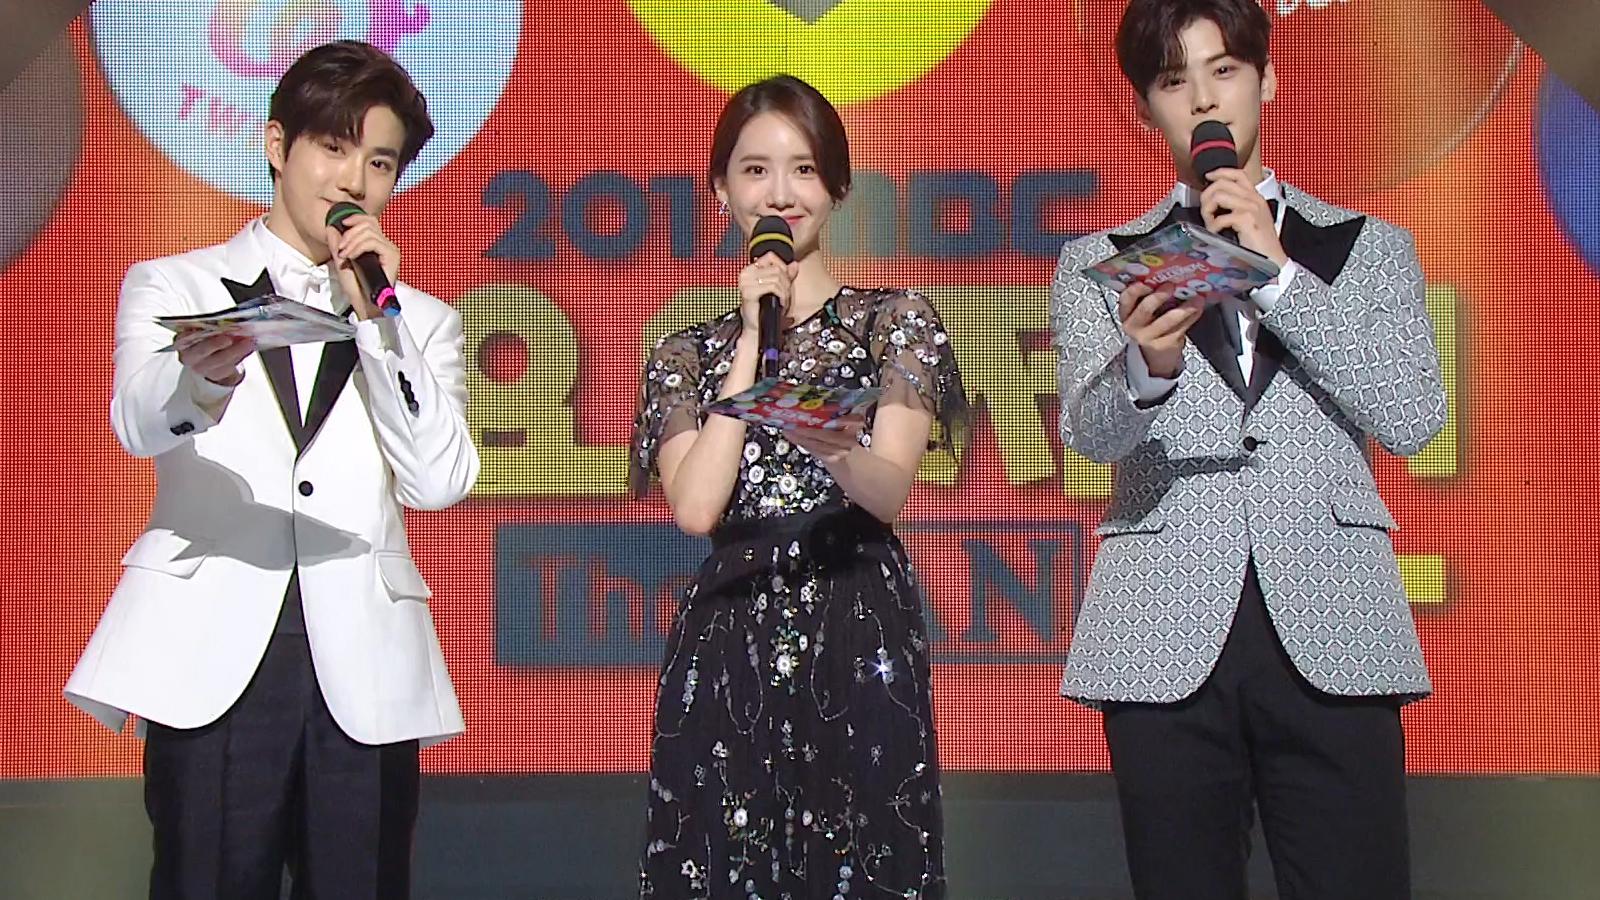 Festival de música MBC 2017 Episodio 2